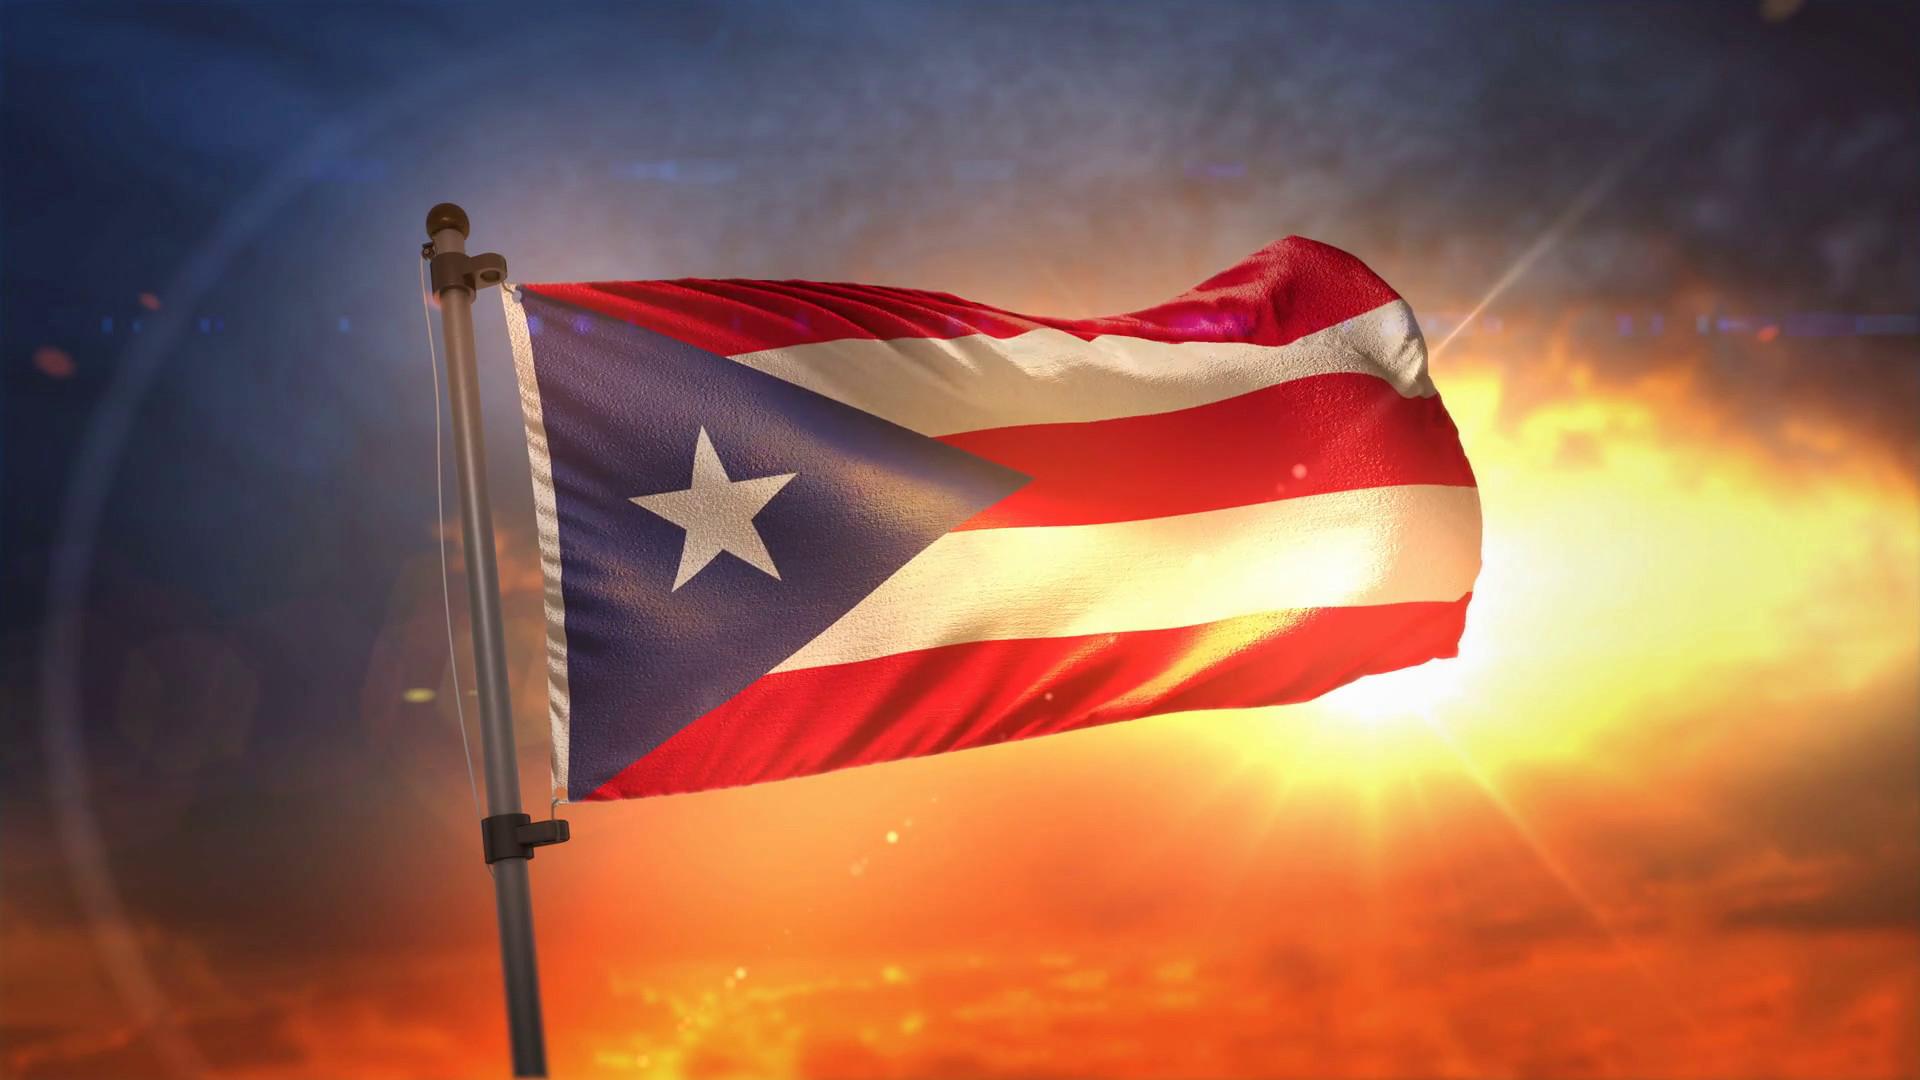 1920x1080 Puerto Rico Flag Backlit At Beautiful Sunrise Loop Slow Motion 4K Background